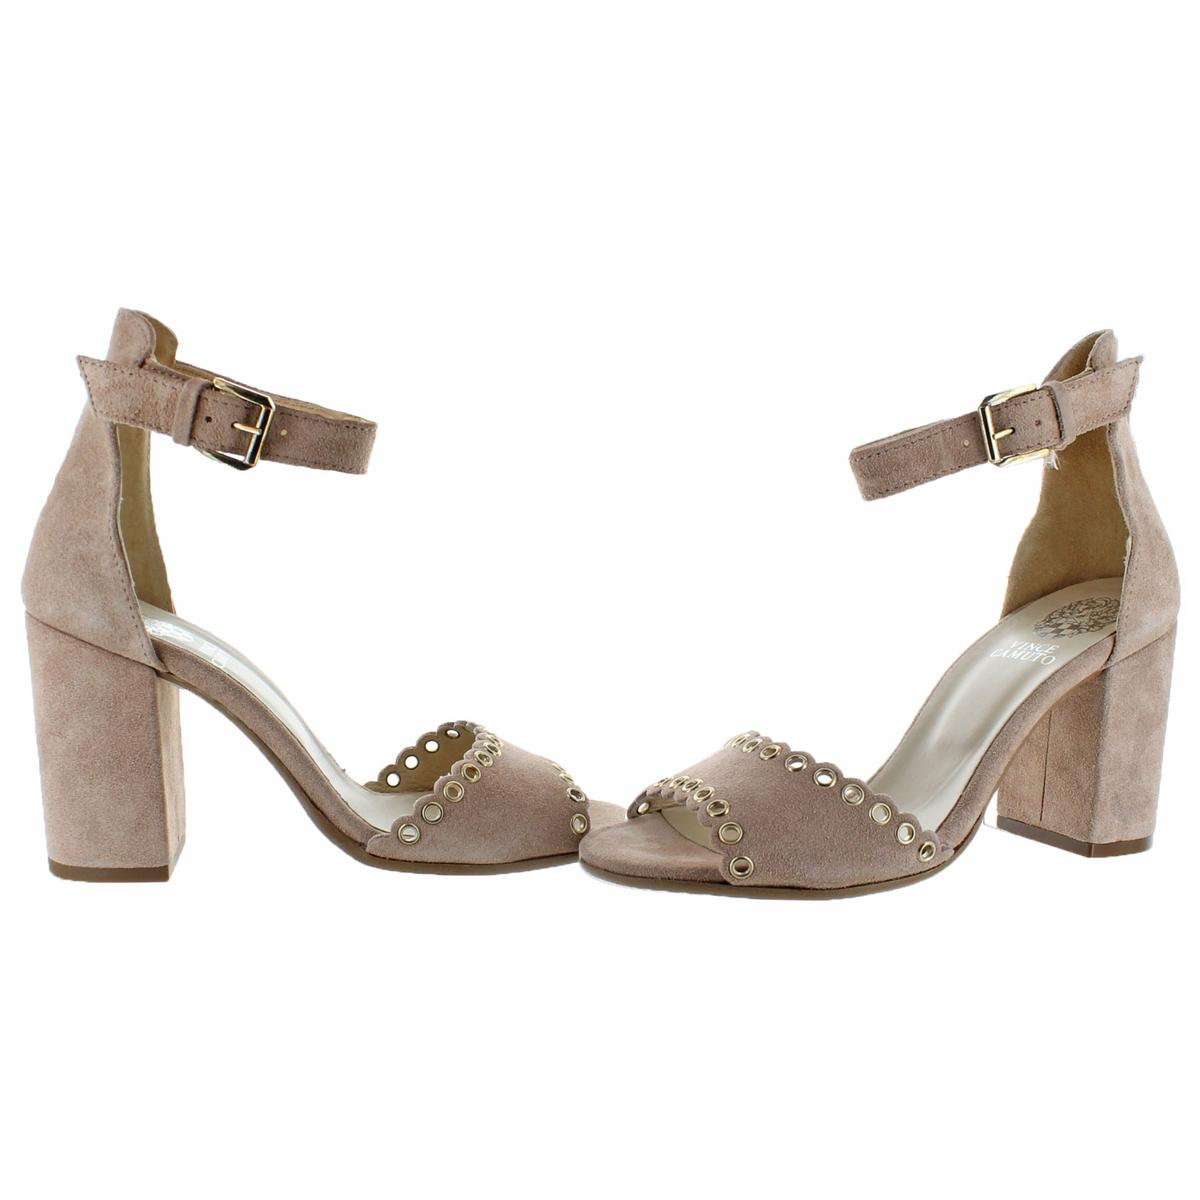 Vince-Camuto-Missy-Women-039-s-Suede-Open-Toe-Block-Heel-Dressy-Sandal-Shoes thumbnail 6